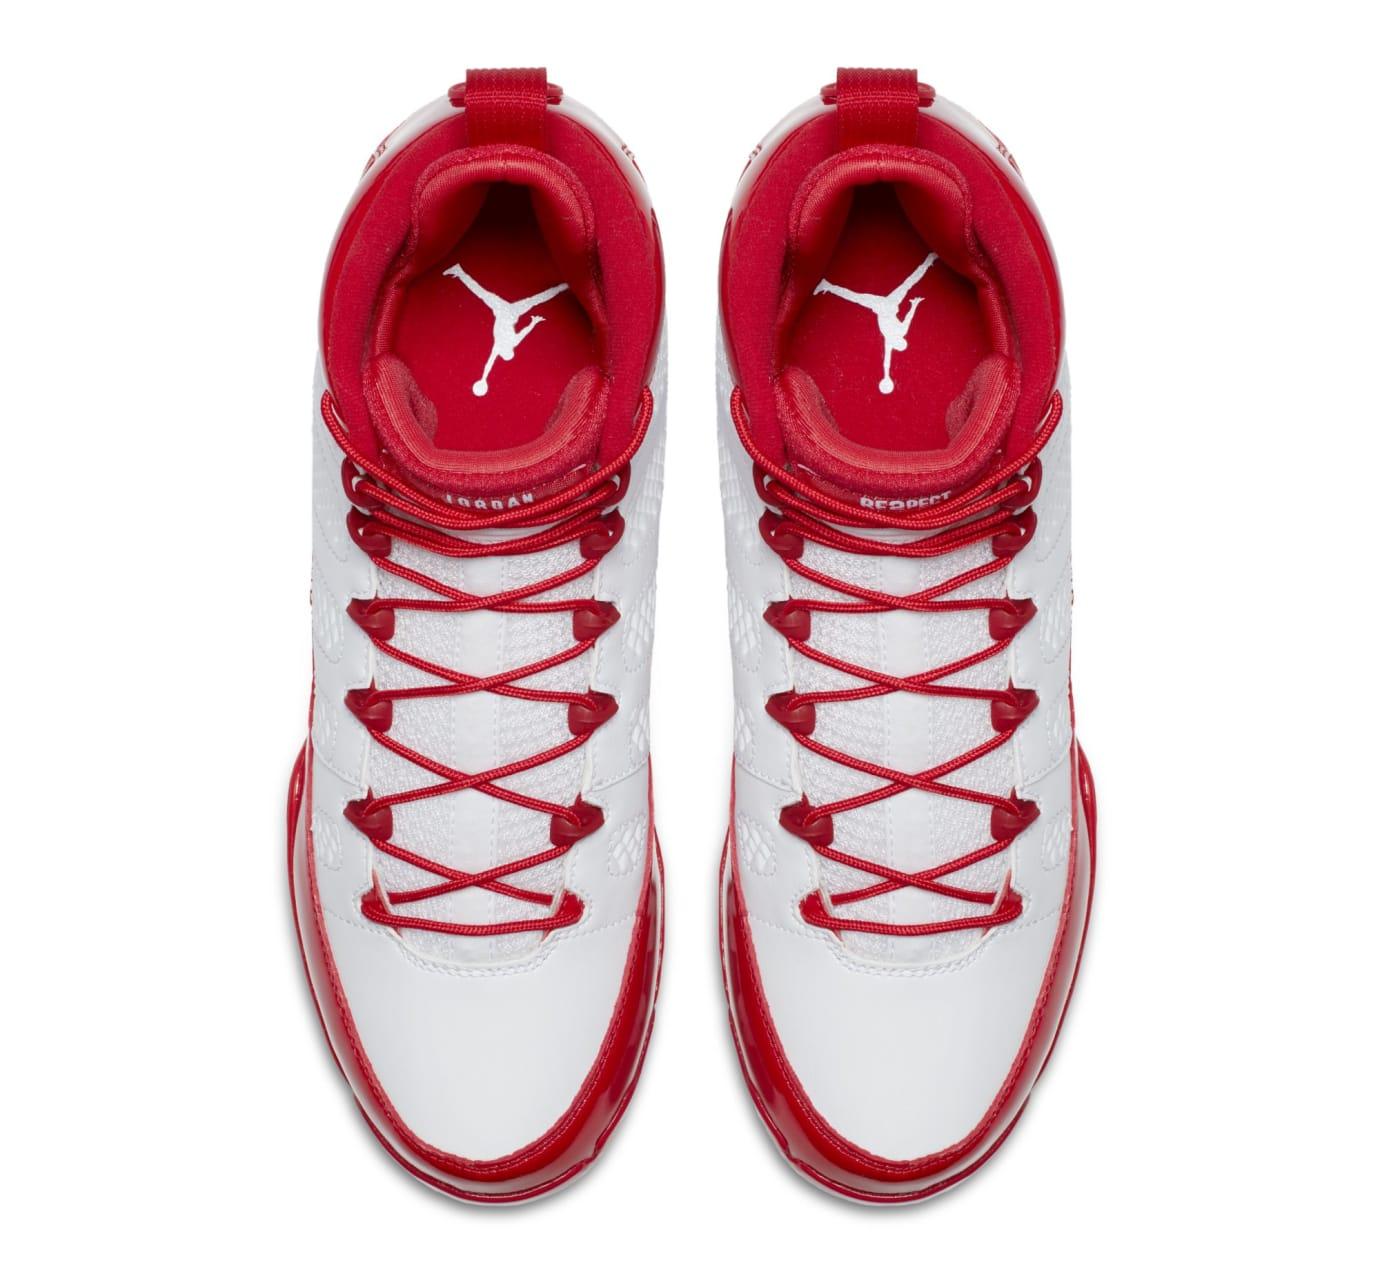 Air Jordan 9 IX MCS Baseball Cleats Red Top